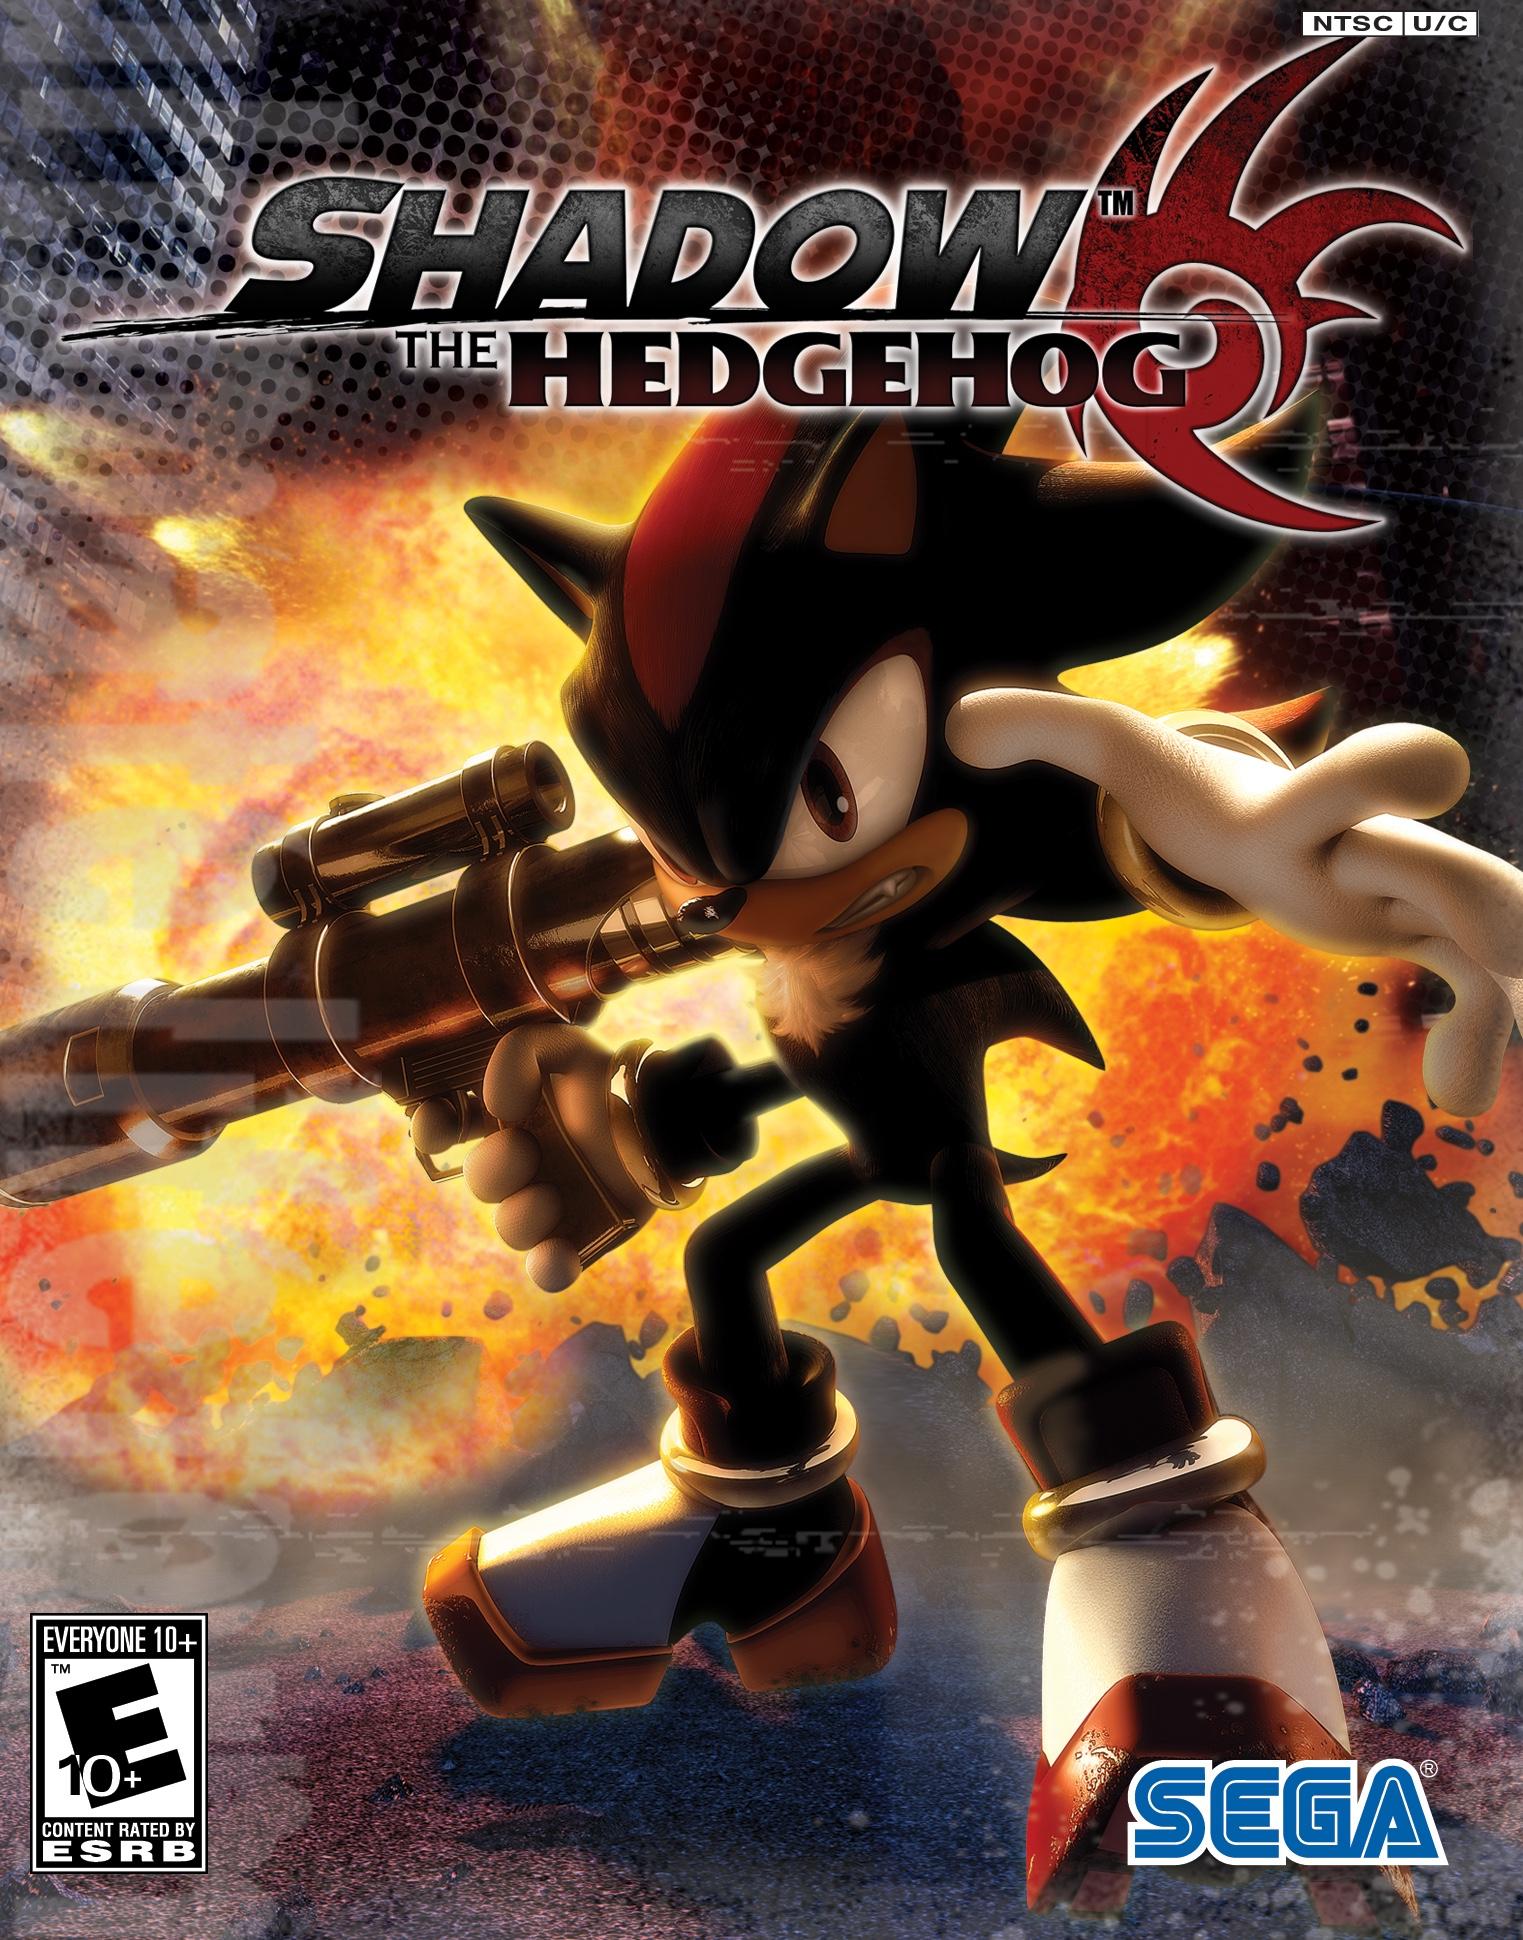 Sonic transformed all shadow scenes